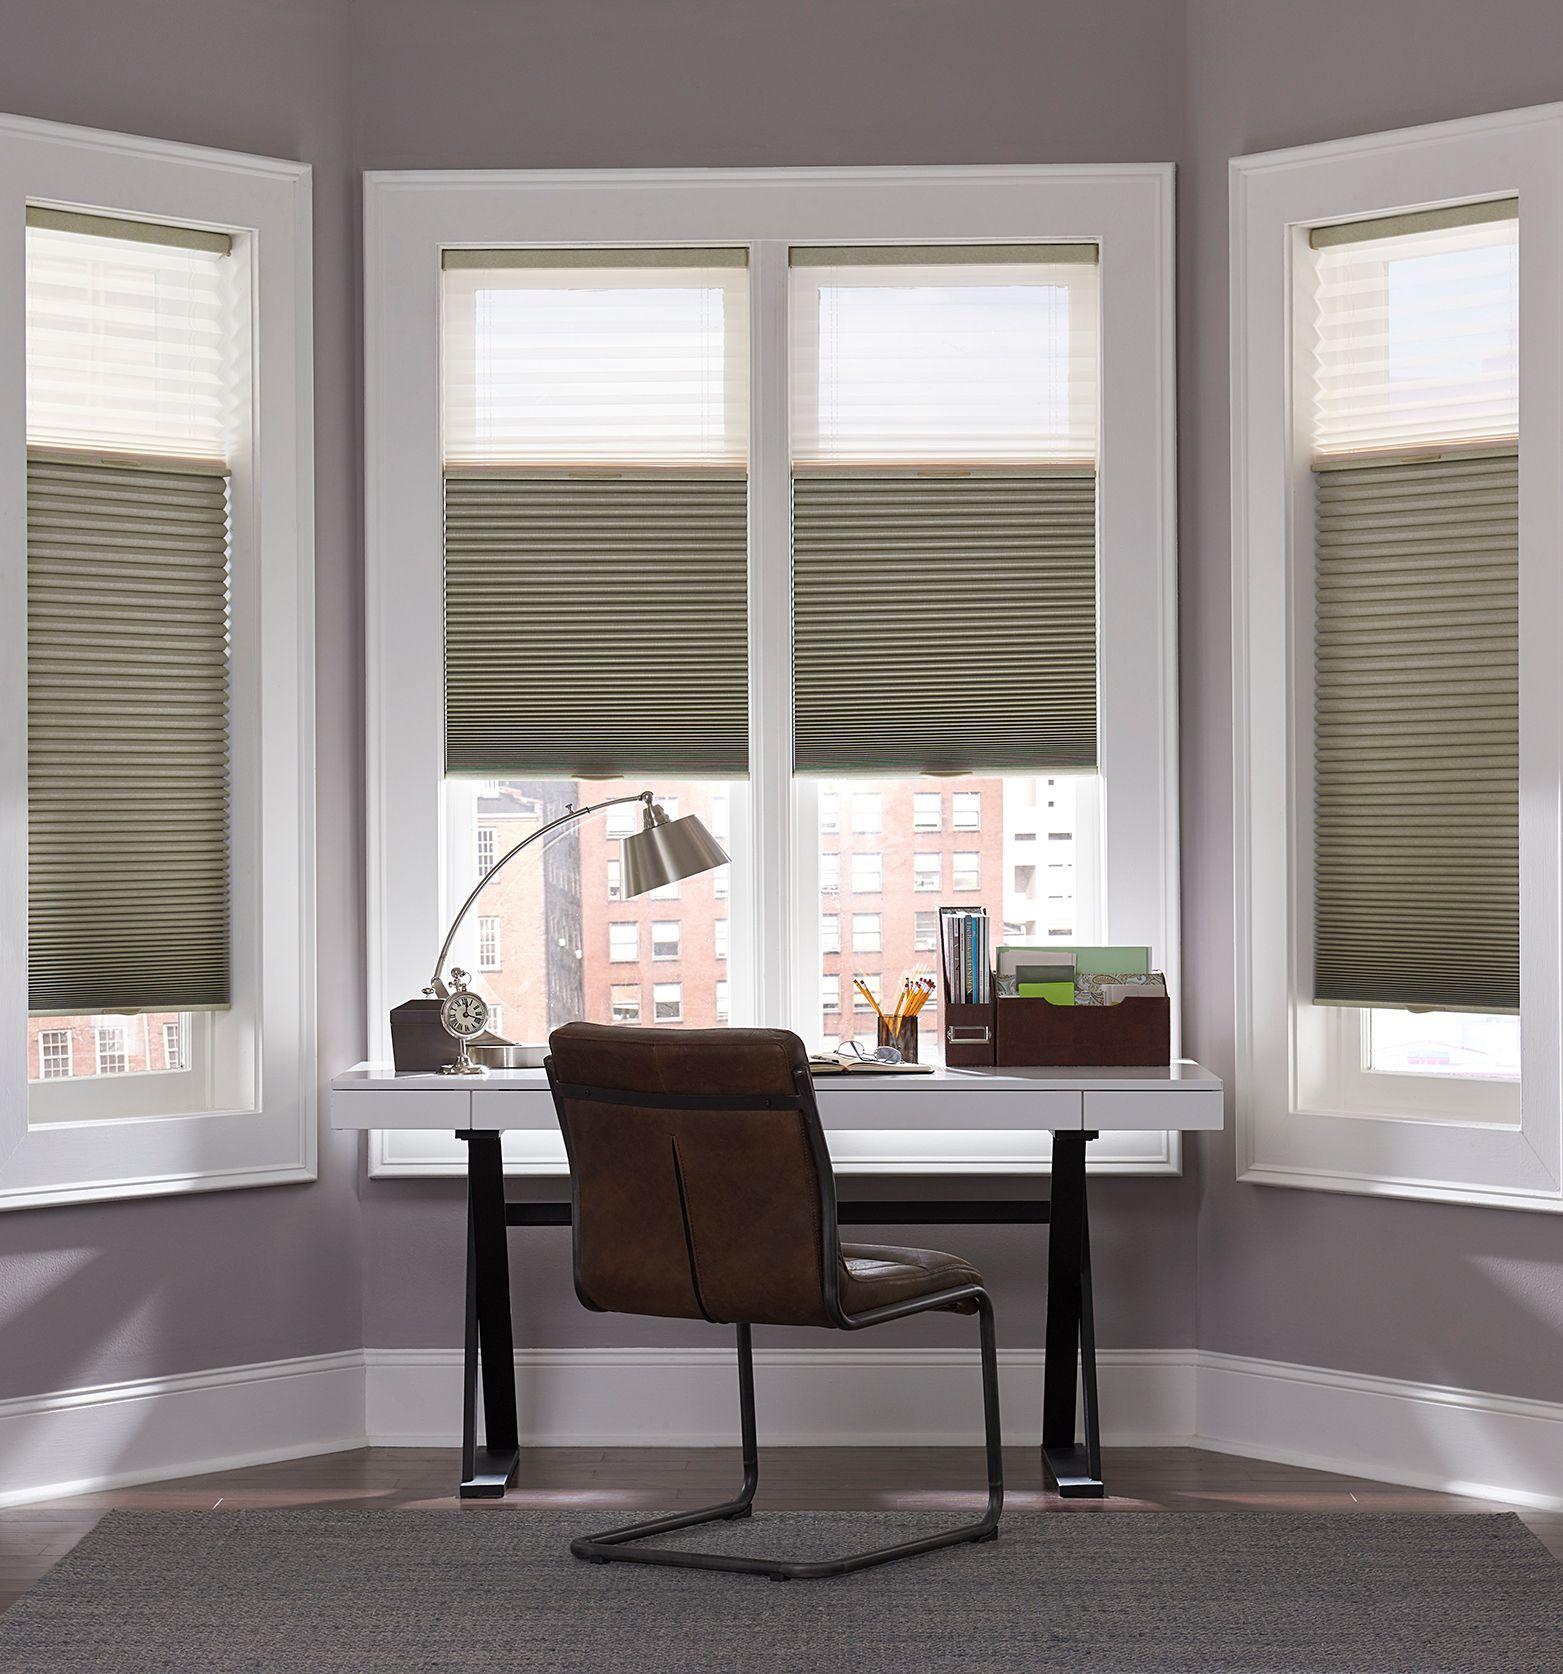 7 Eloquent Simple Ideas Blackout Blinds Bedroom Modern Blinds Layout Patio Blinds Sun Sheer Blinds Sim Blinds For Windows Bay Window Blinds Living Room Blinds